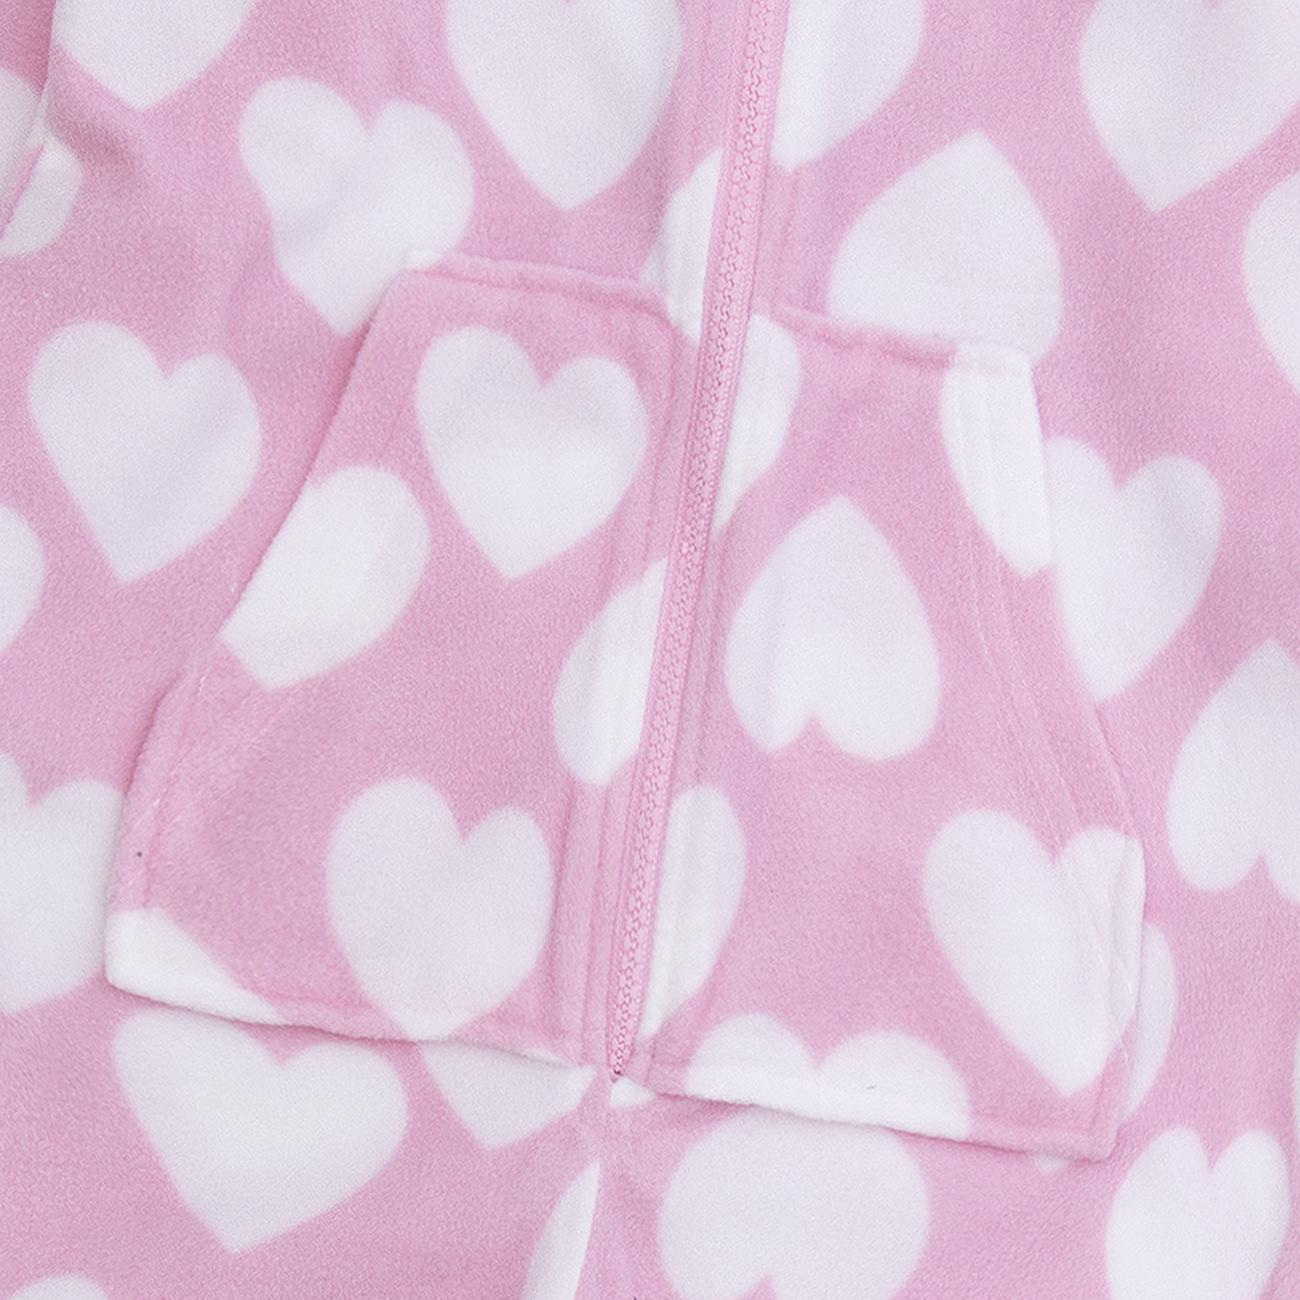 Onezee Girls Kids Hooded All-In-One Jumpsuit Heart Print Snuggle Microfleece